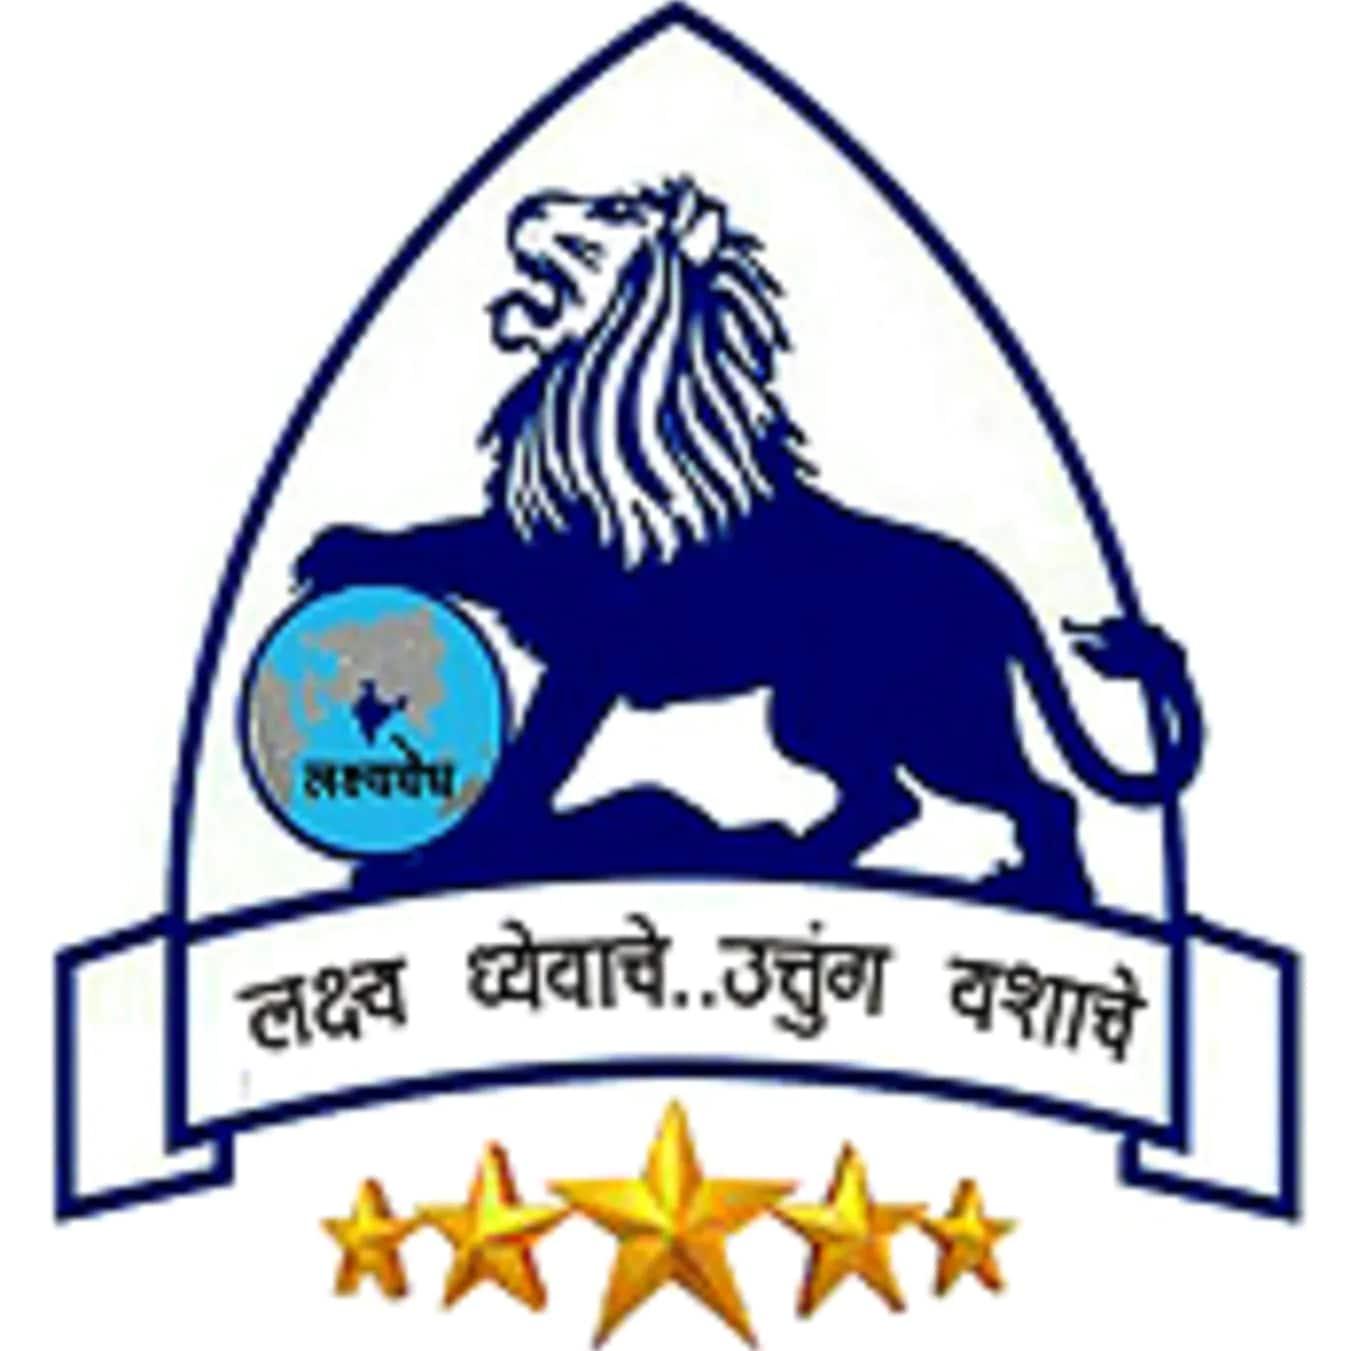 lakshyavedh career academy gallery